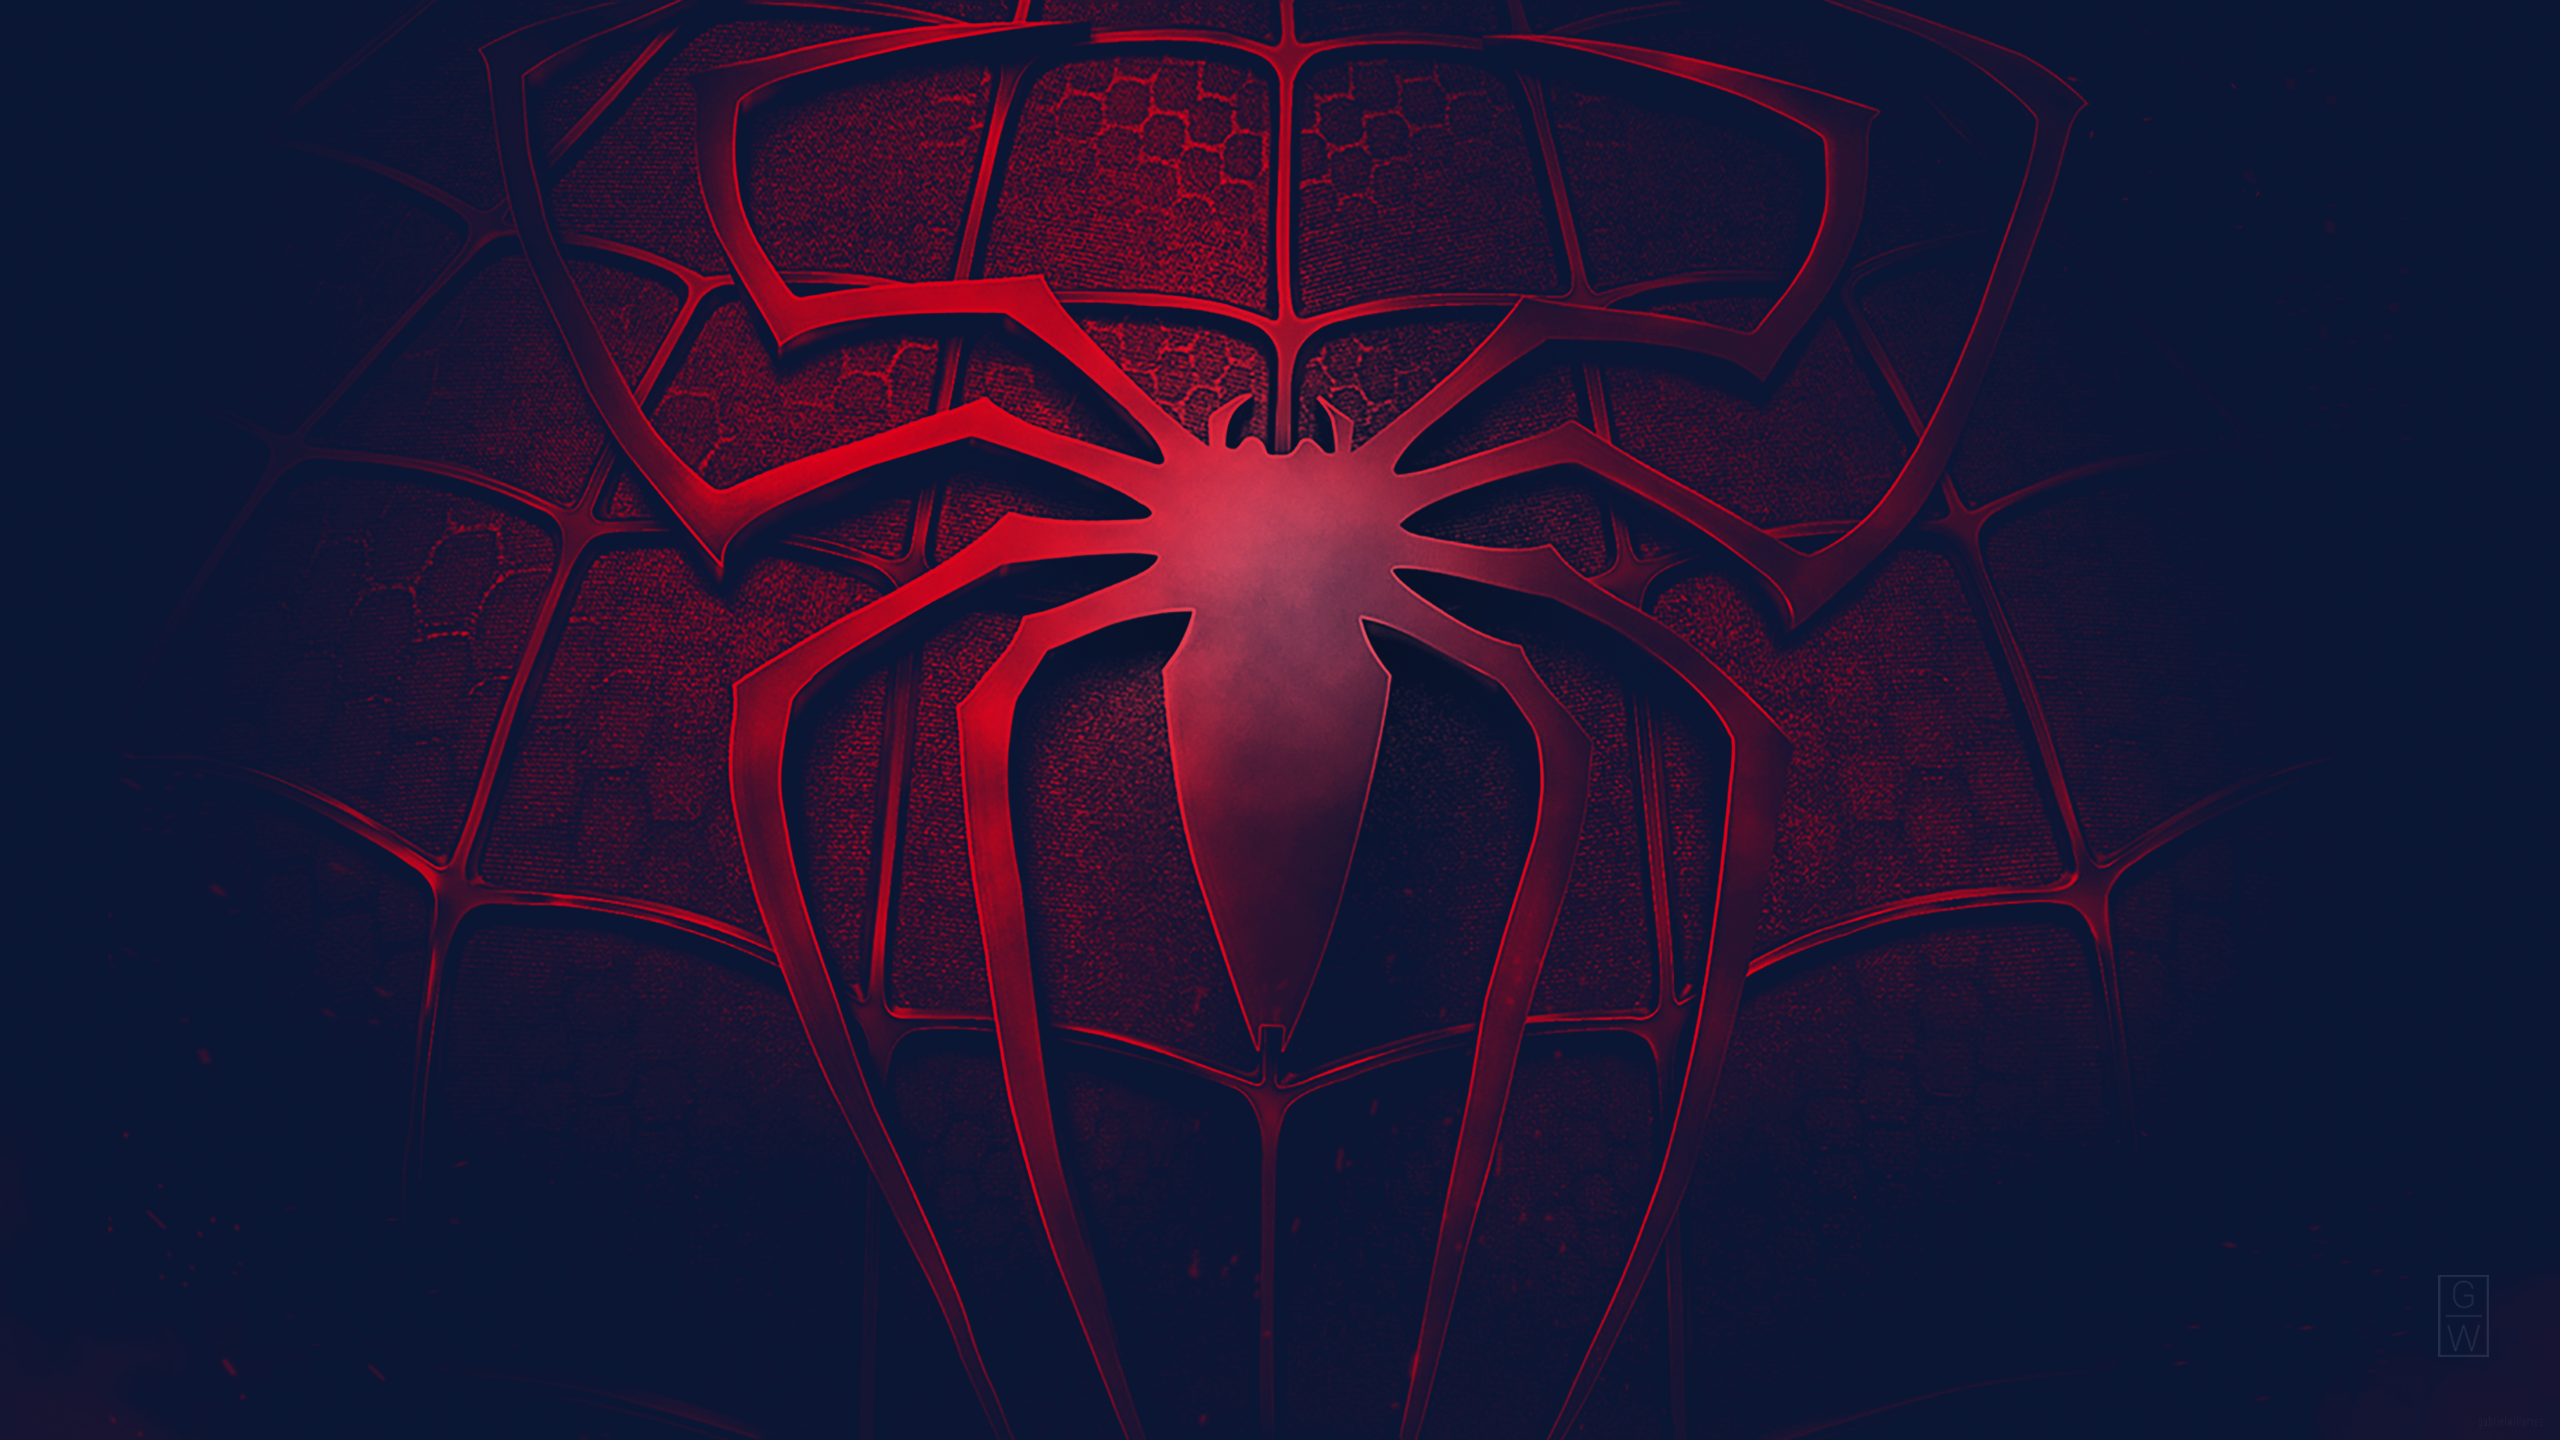 spiderman 3 wallpaper hd full hd fondo de pantalla and